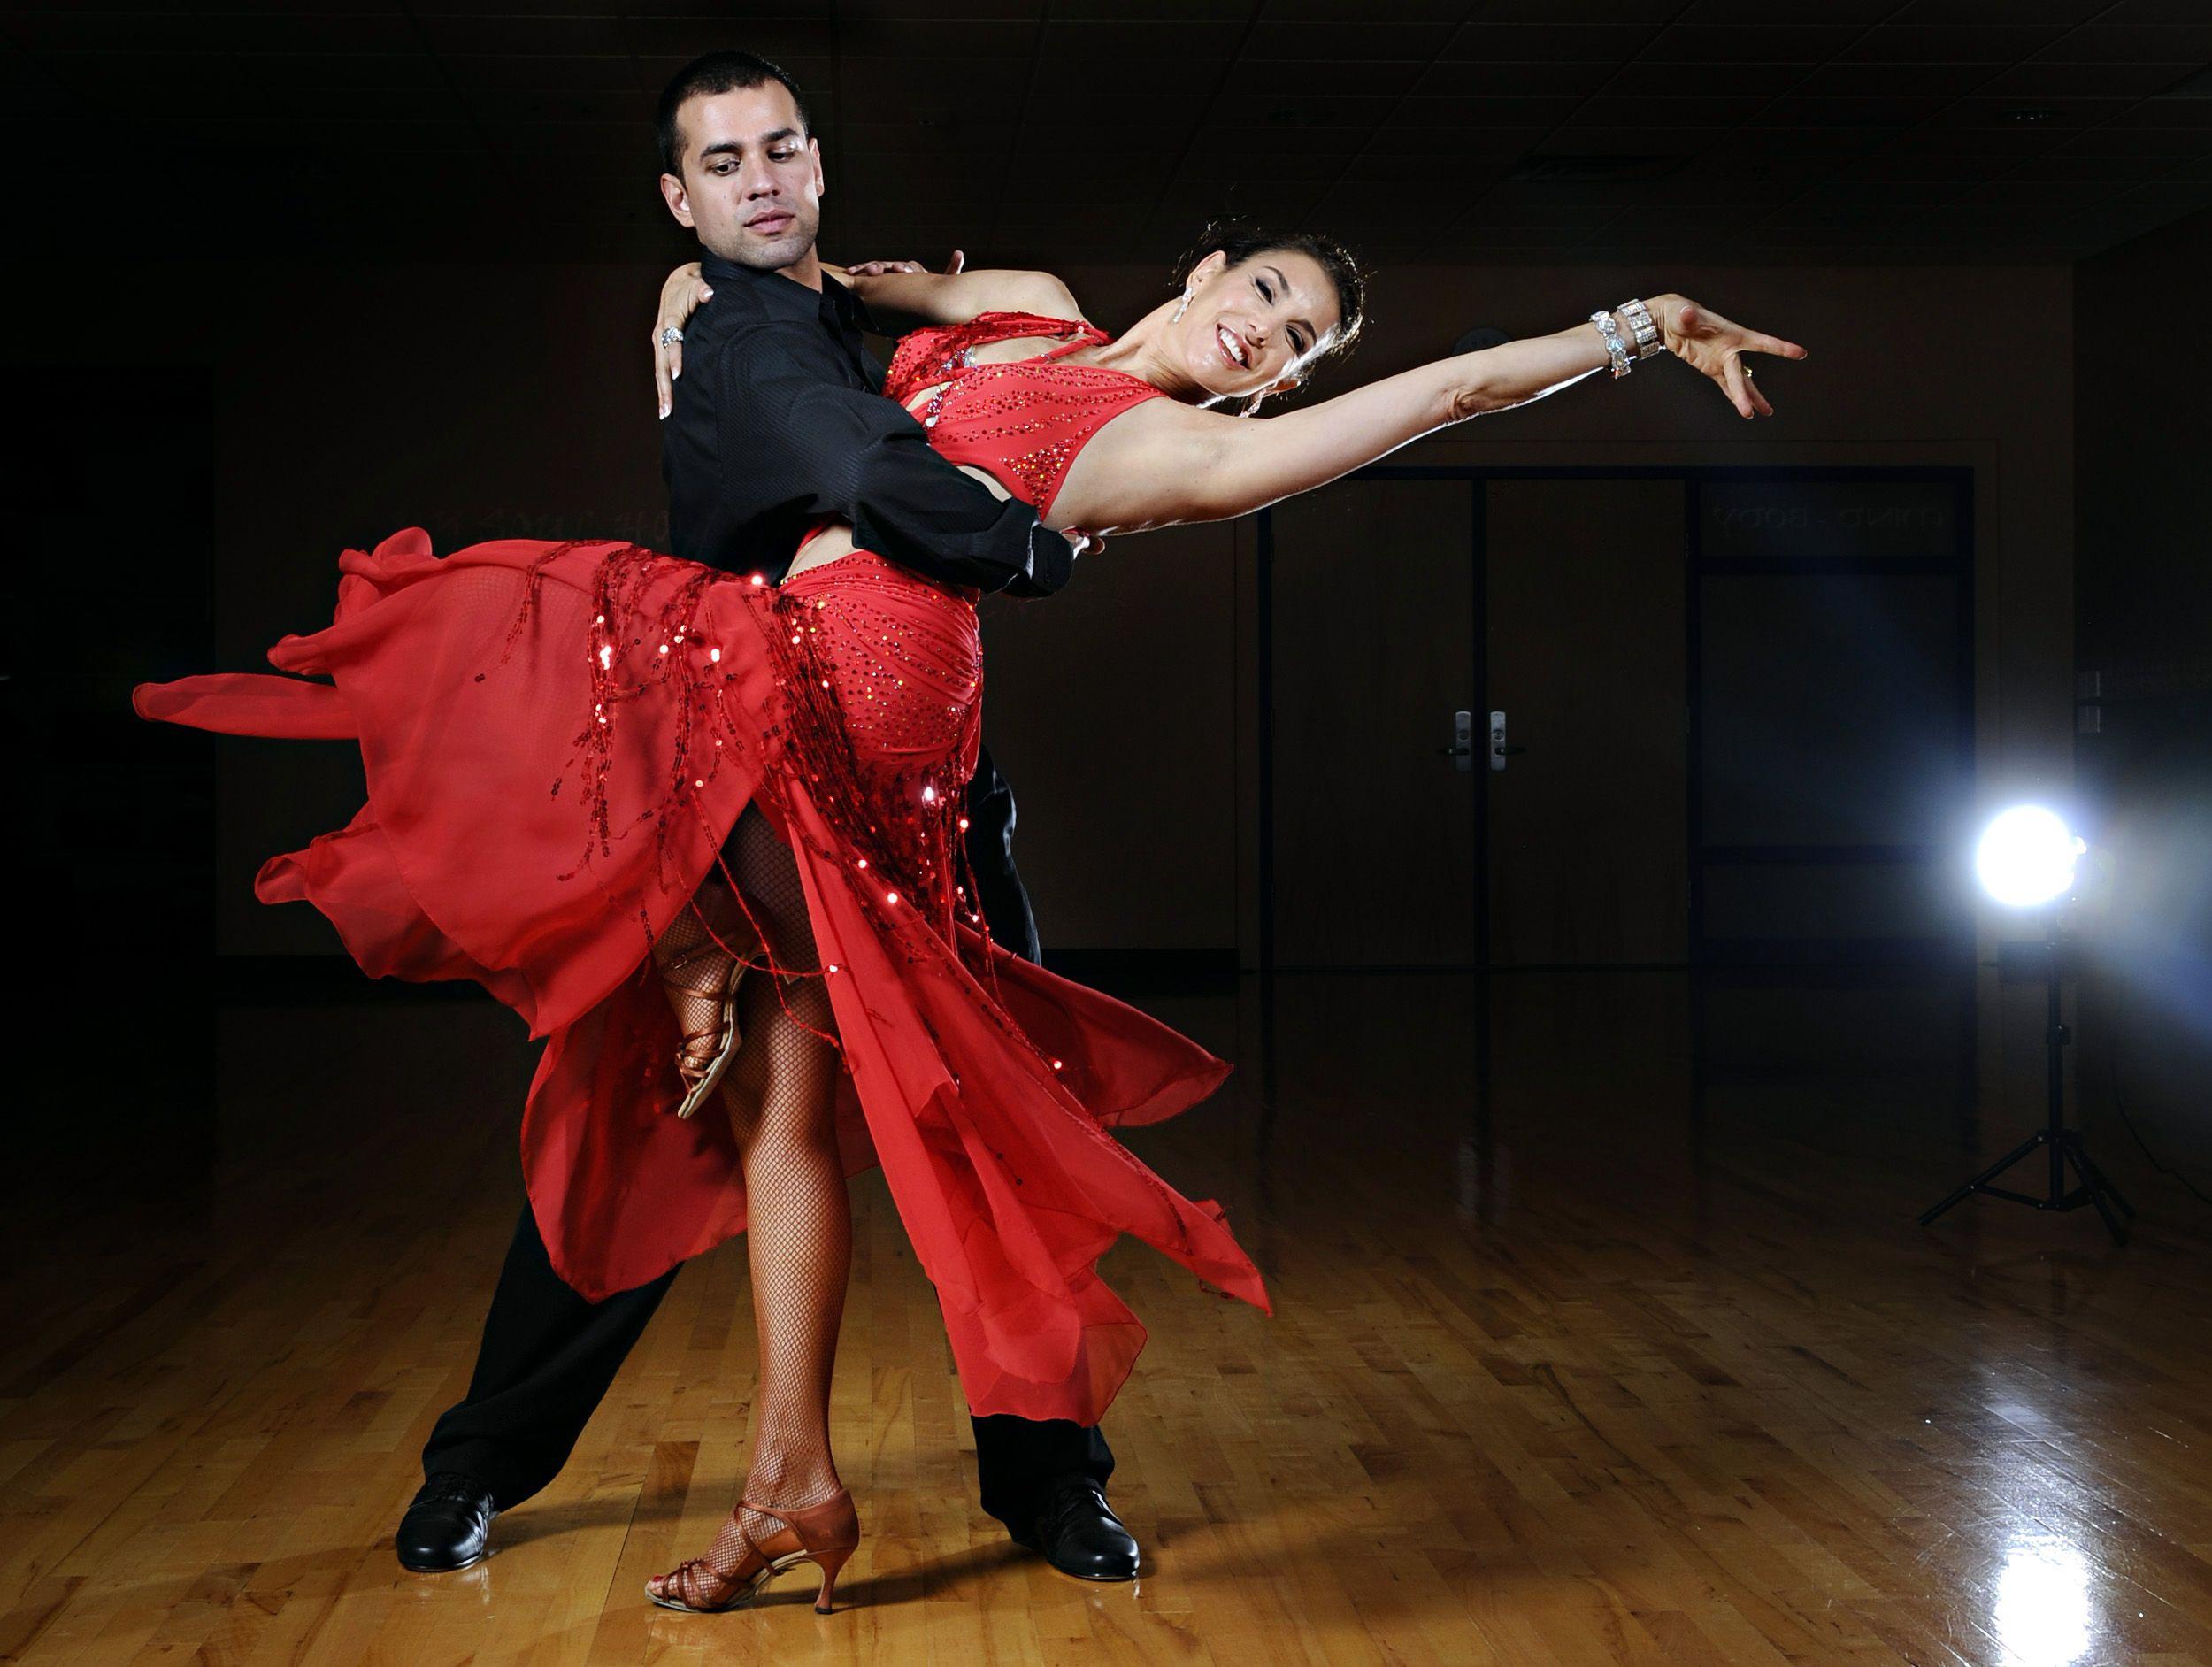 Ballroomdancing there is a large increase in ballroom